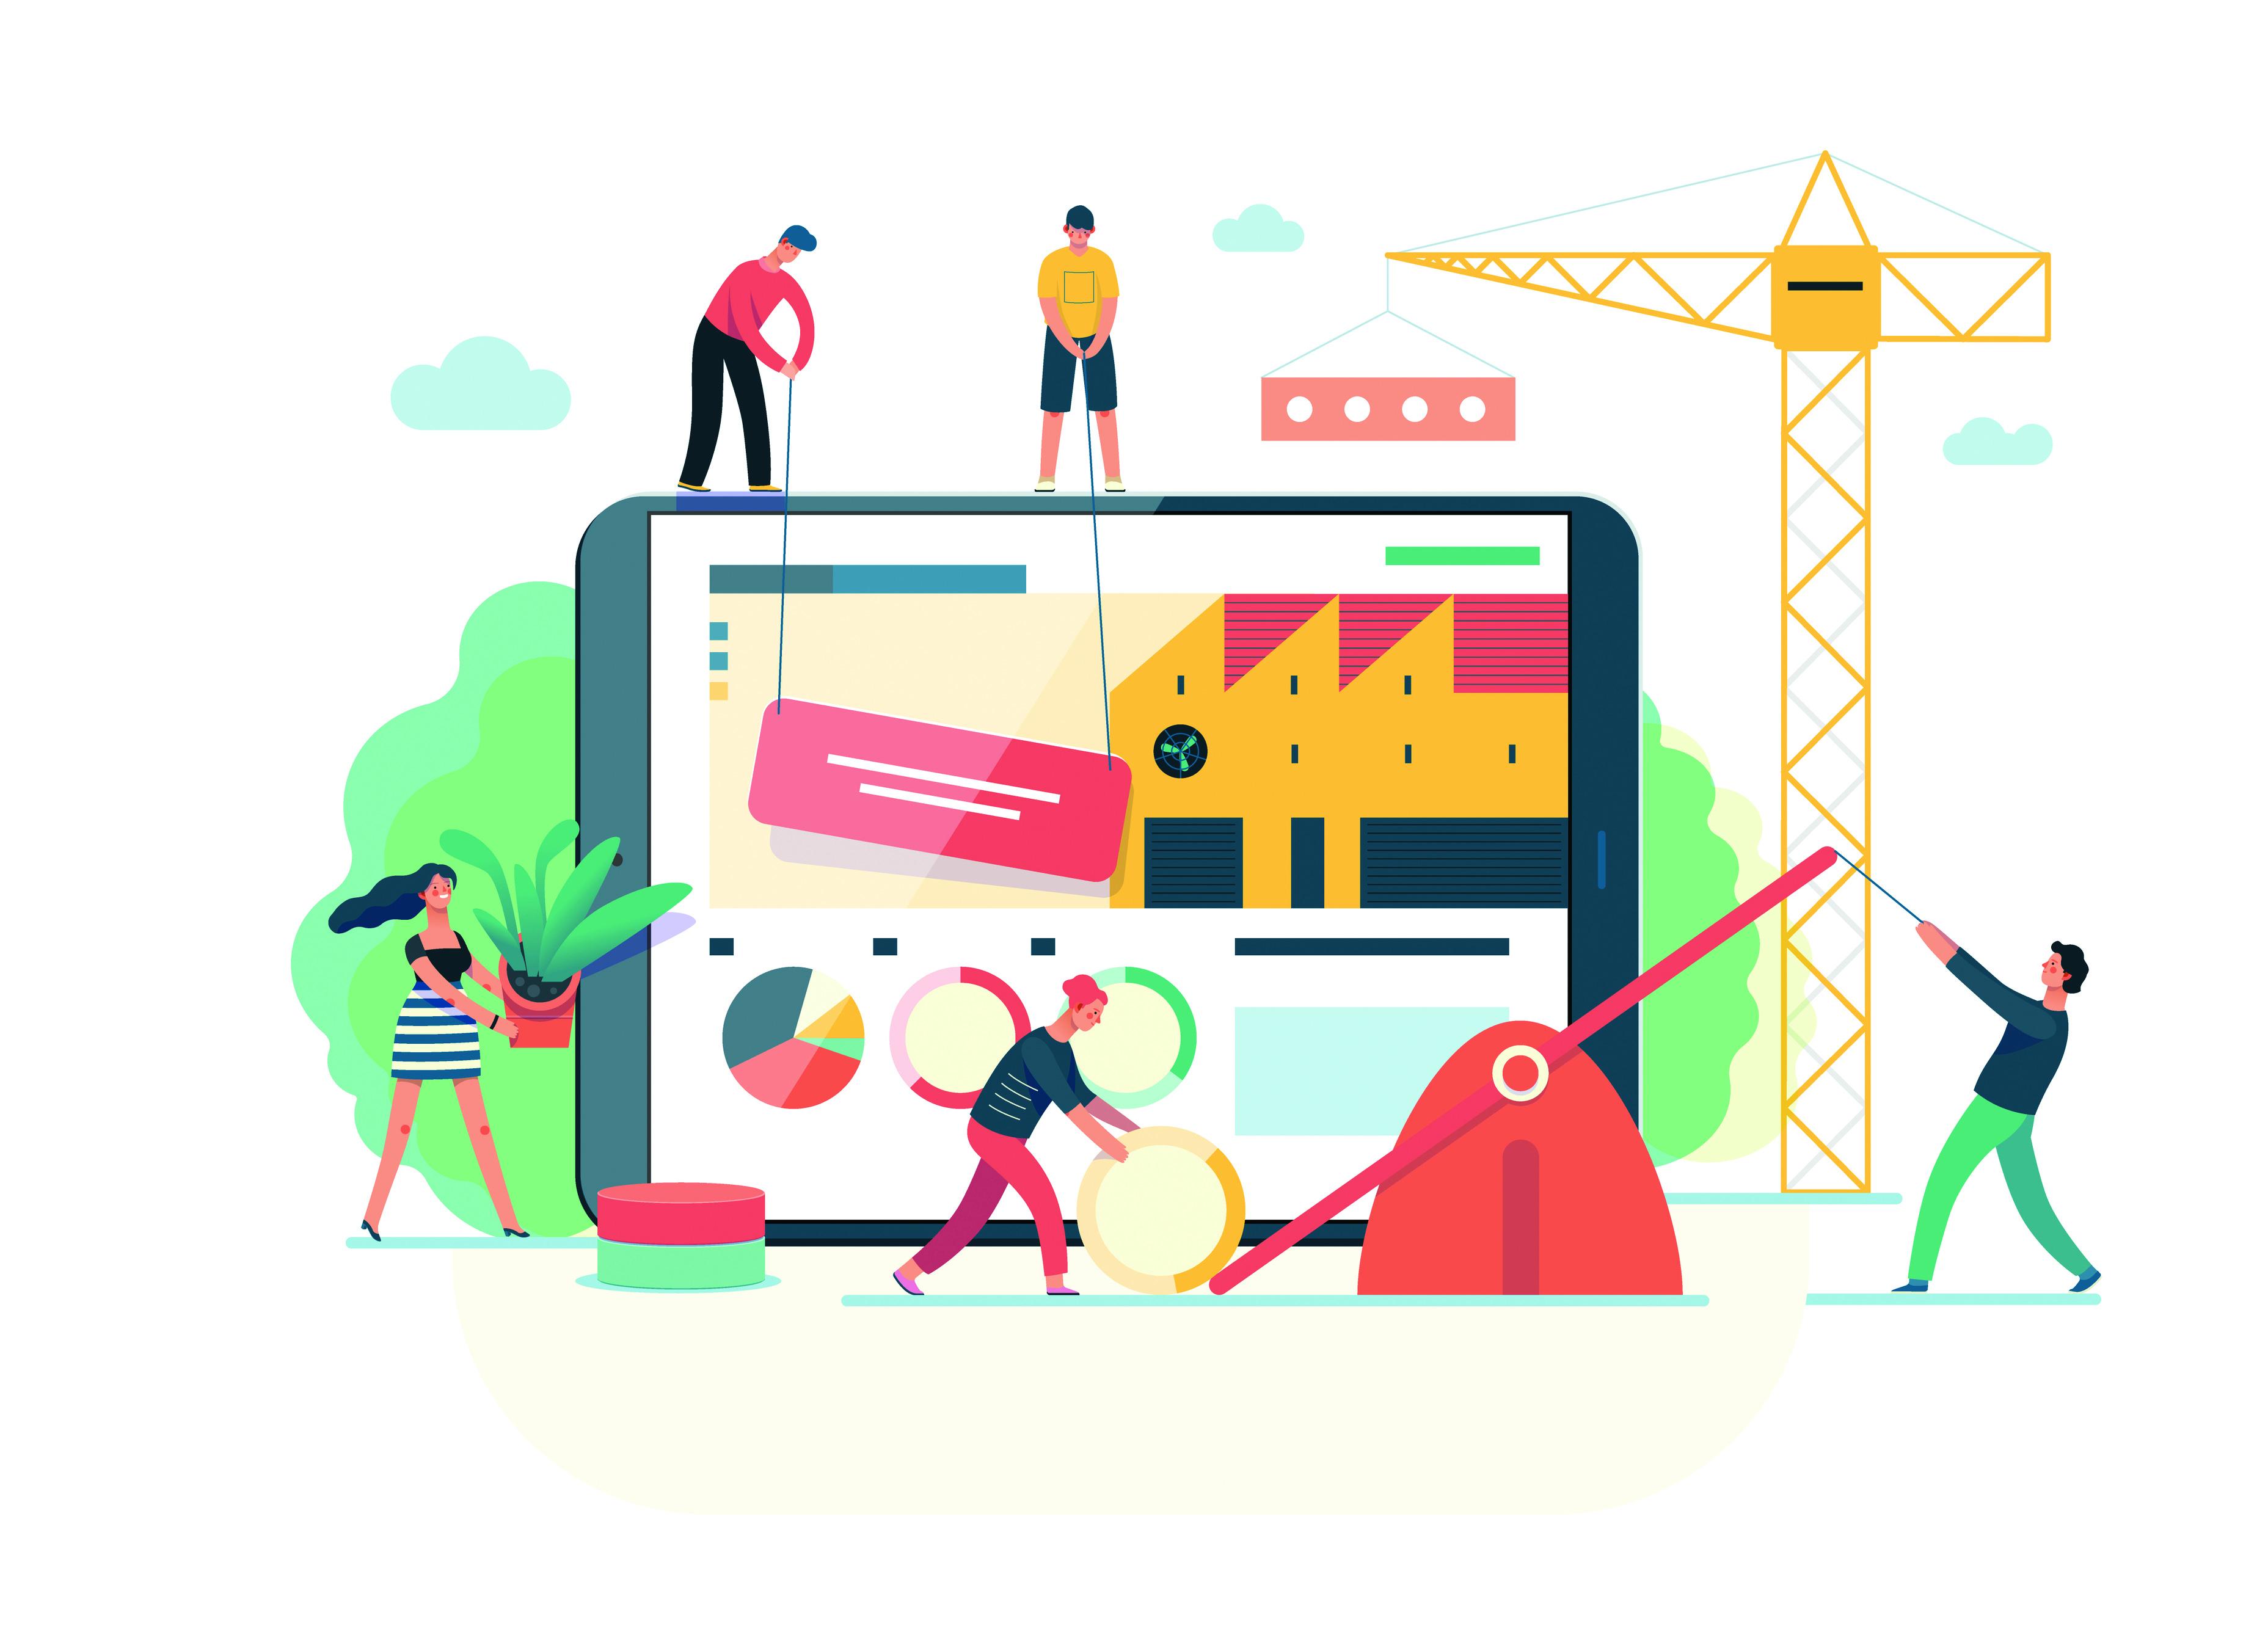 Enhancing customer experiences